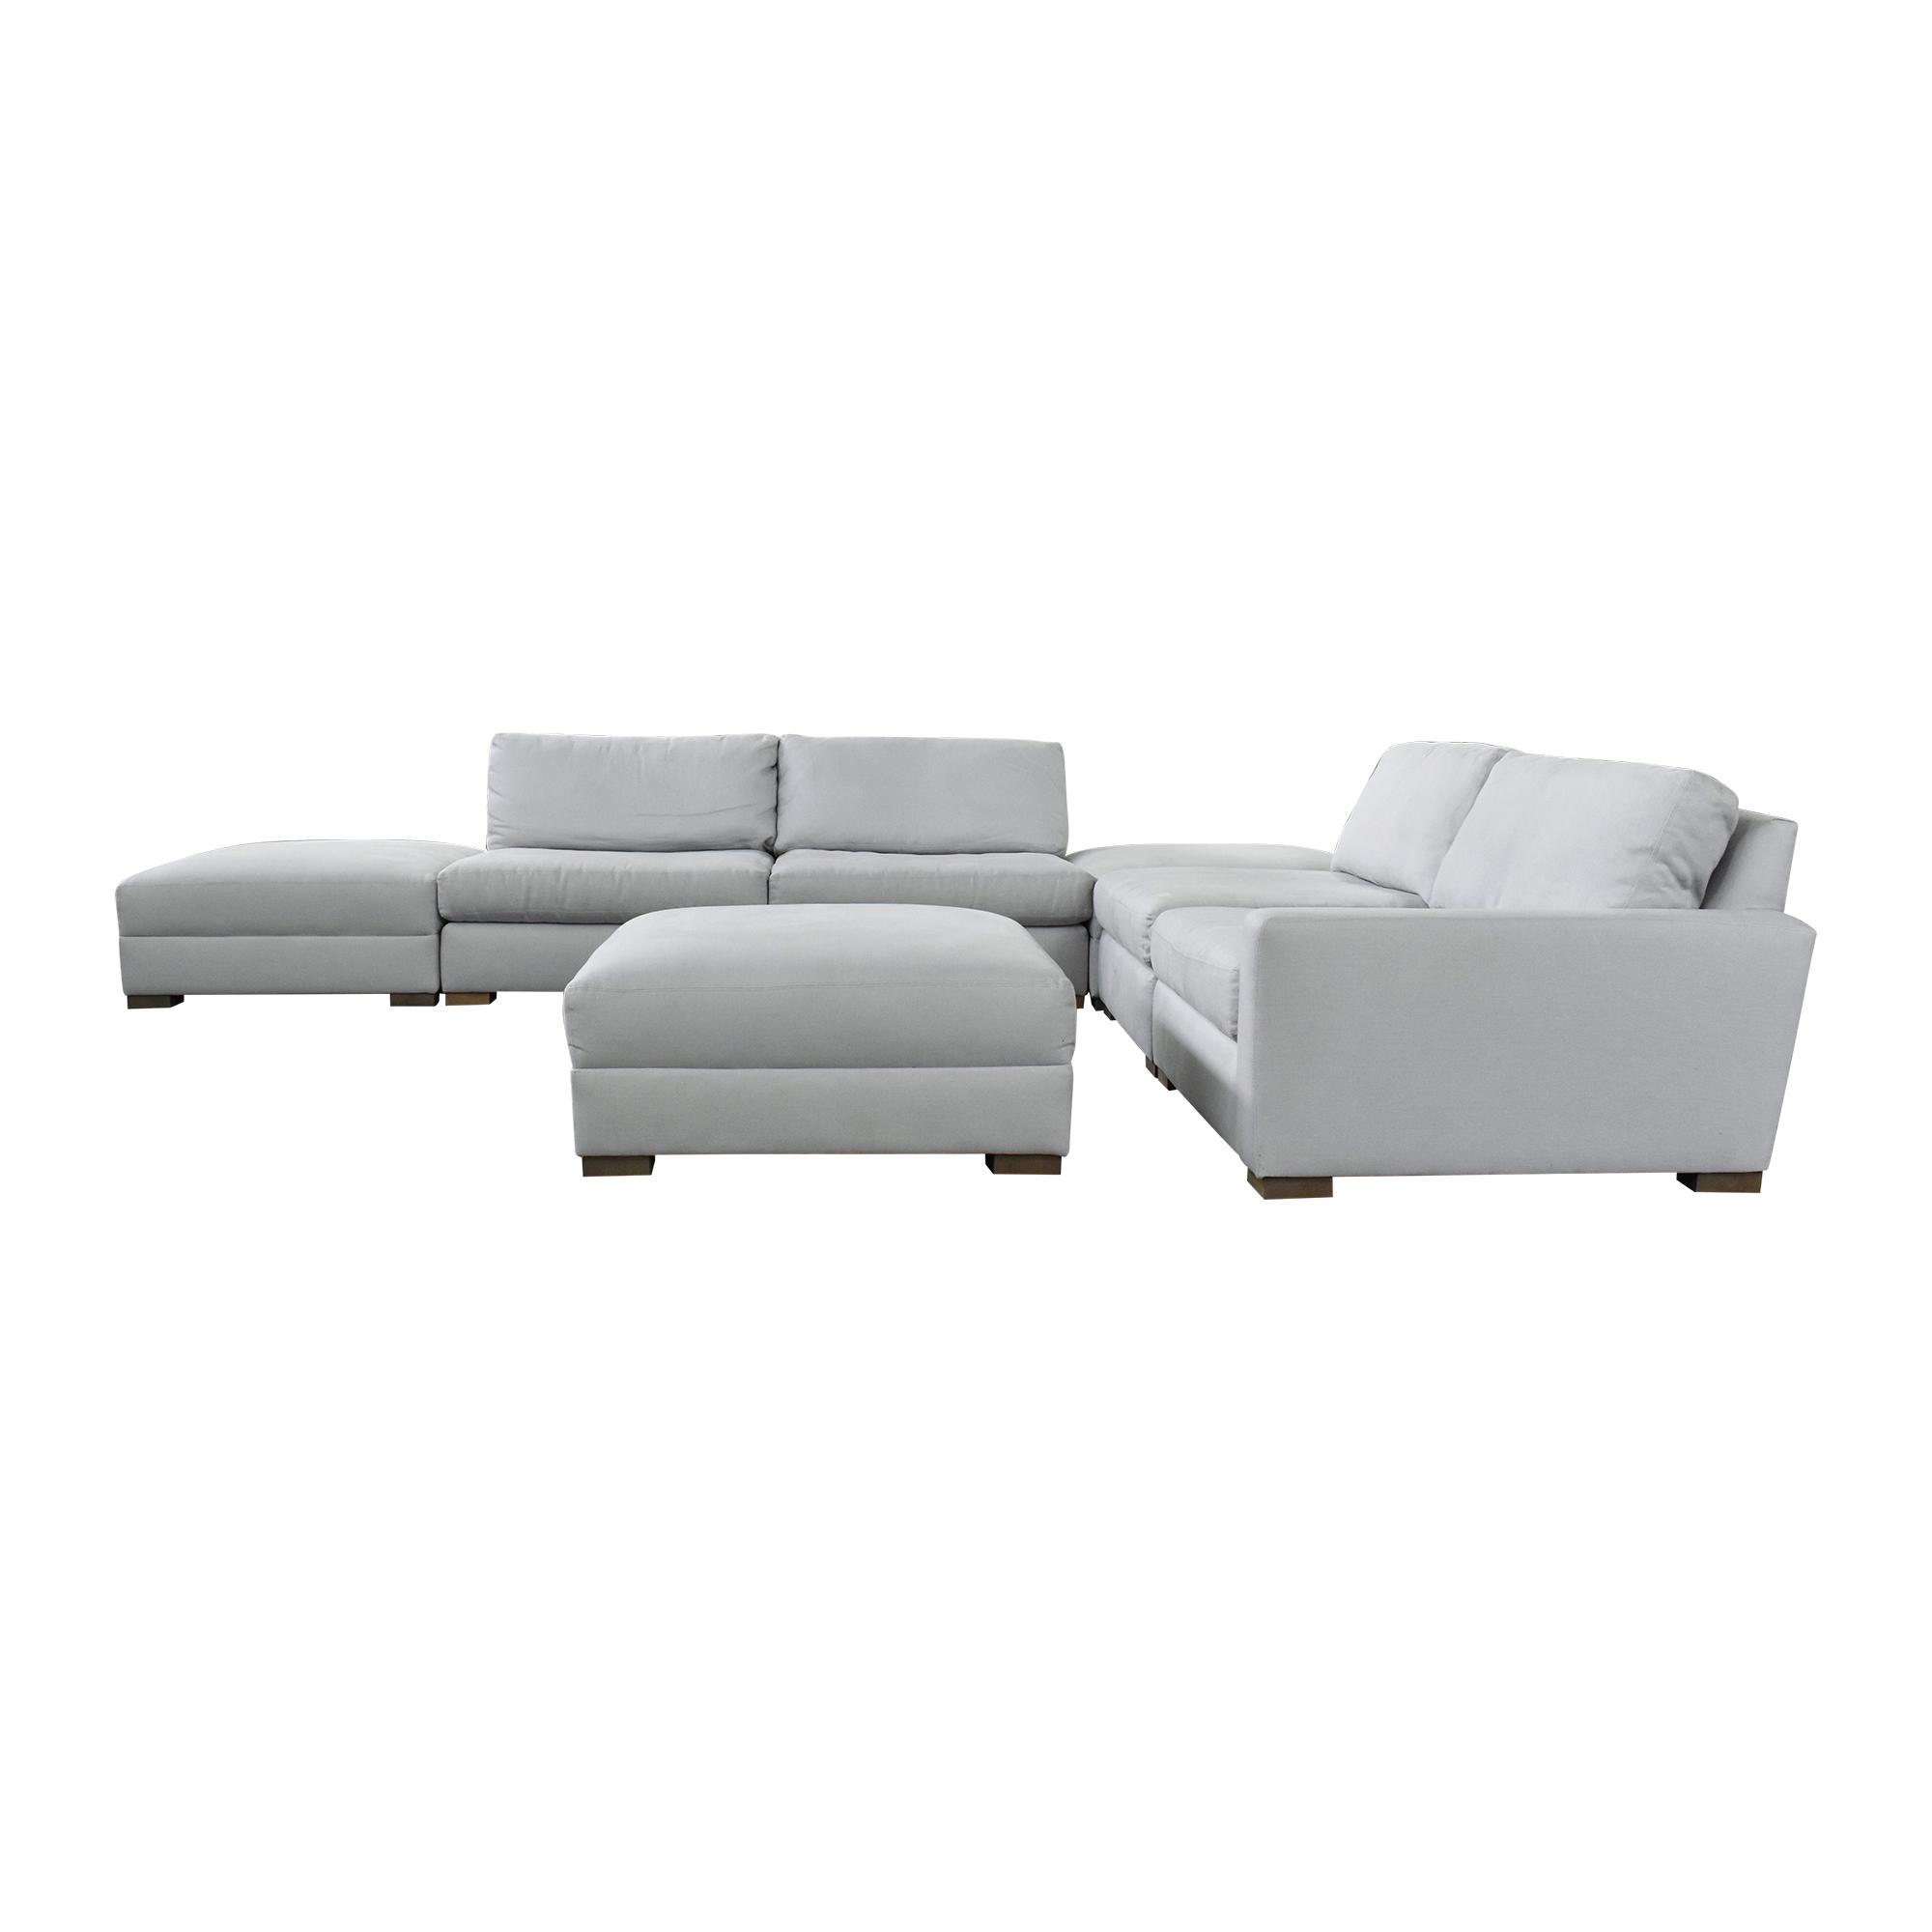 buy Restoration Hardware Maxwell Modular Seven-Piece Sectional Sofa Restoration Hardware Sectionals